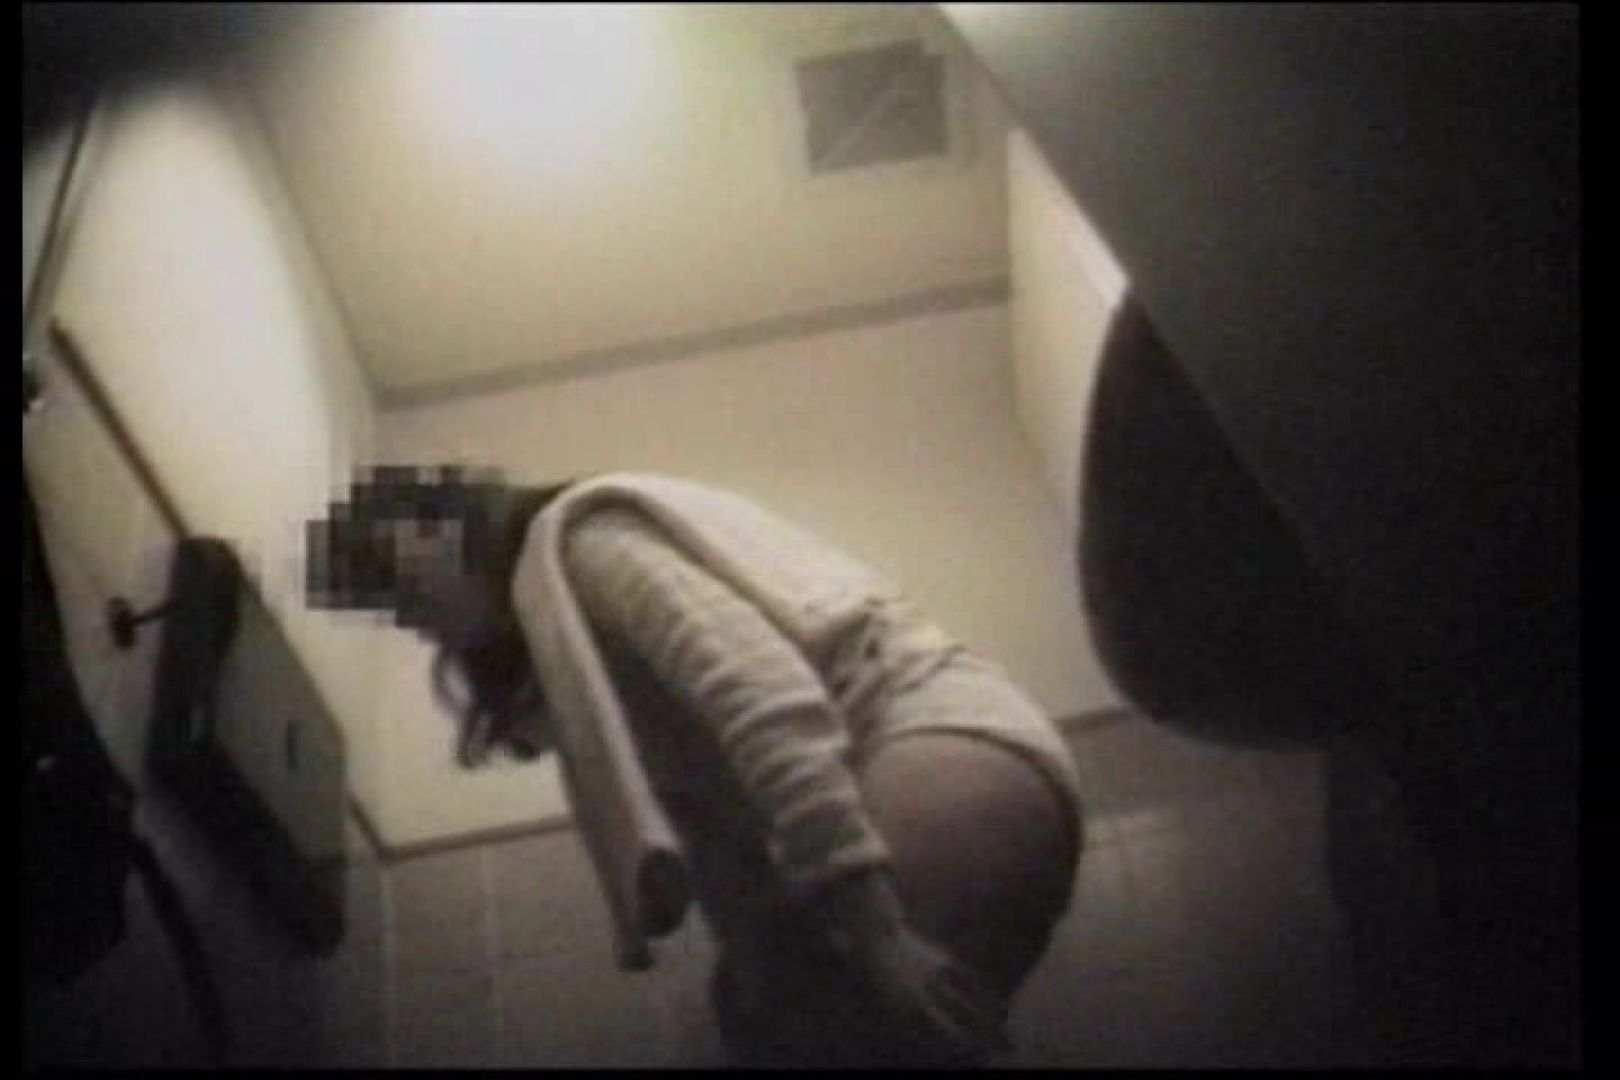 STY-017 女子大生● 独占!生中継! 和式トイレ | 女子大生丸裸  76pic 49